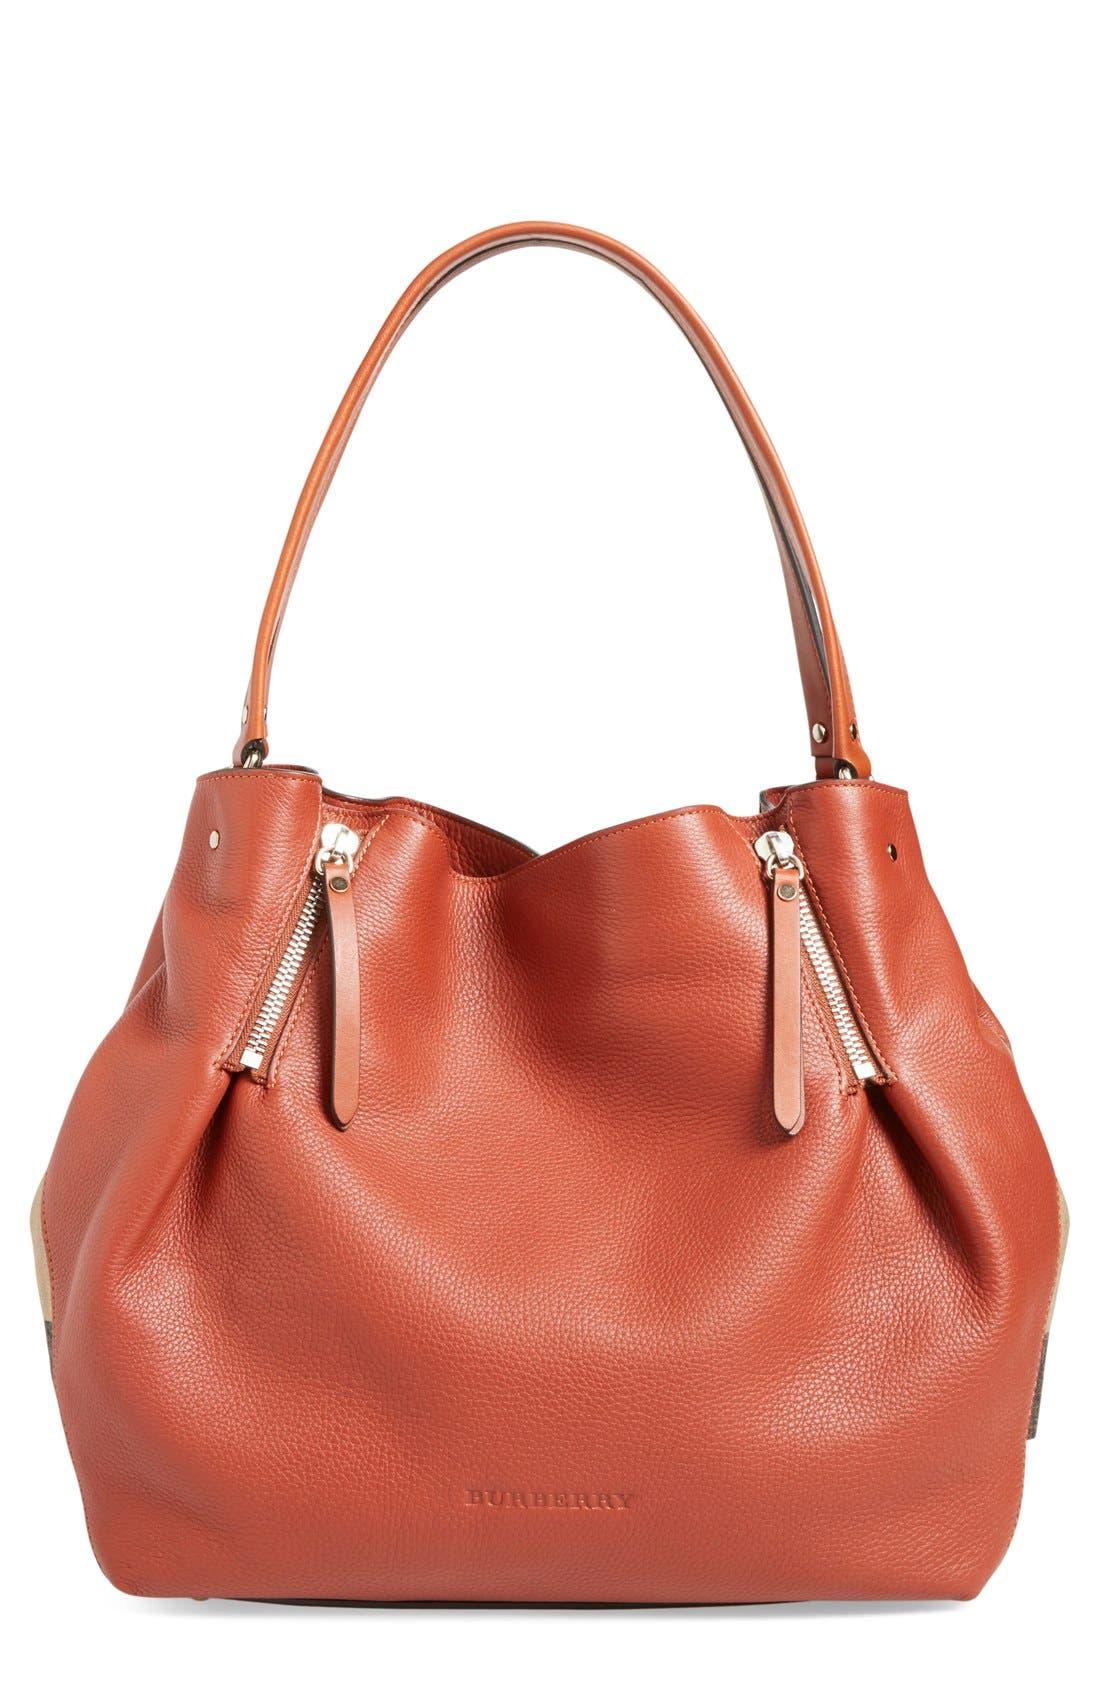 BURBERRY, 'Medium Maidstone' Leather Tote, Main thumbnail 1, color, 200